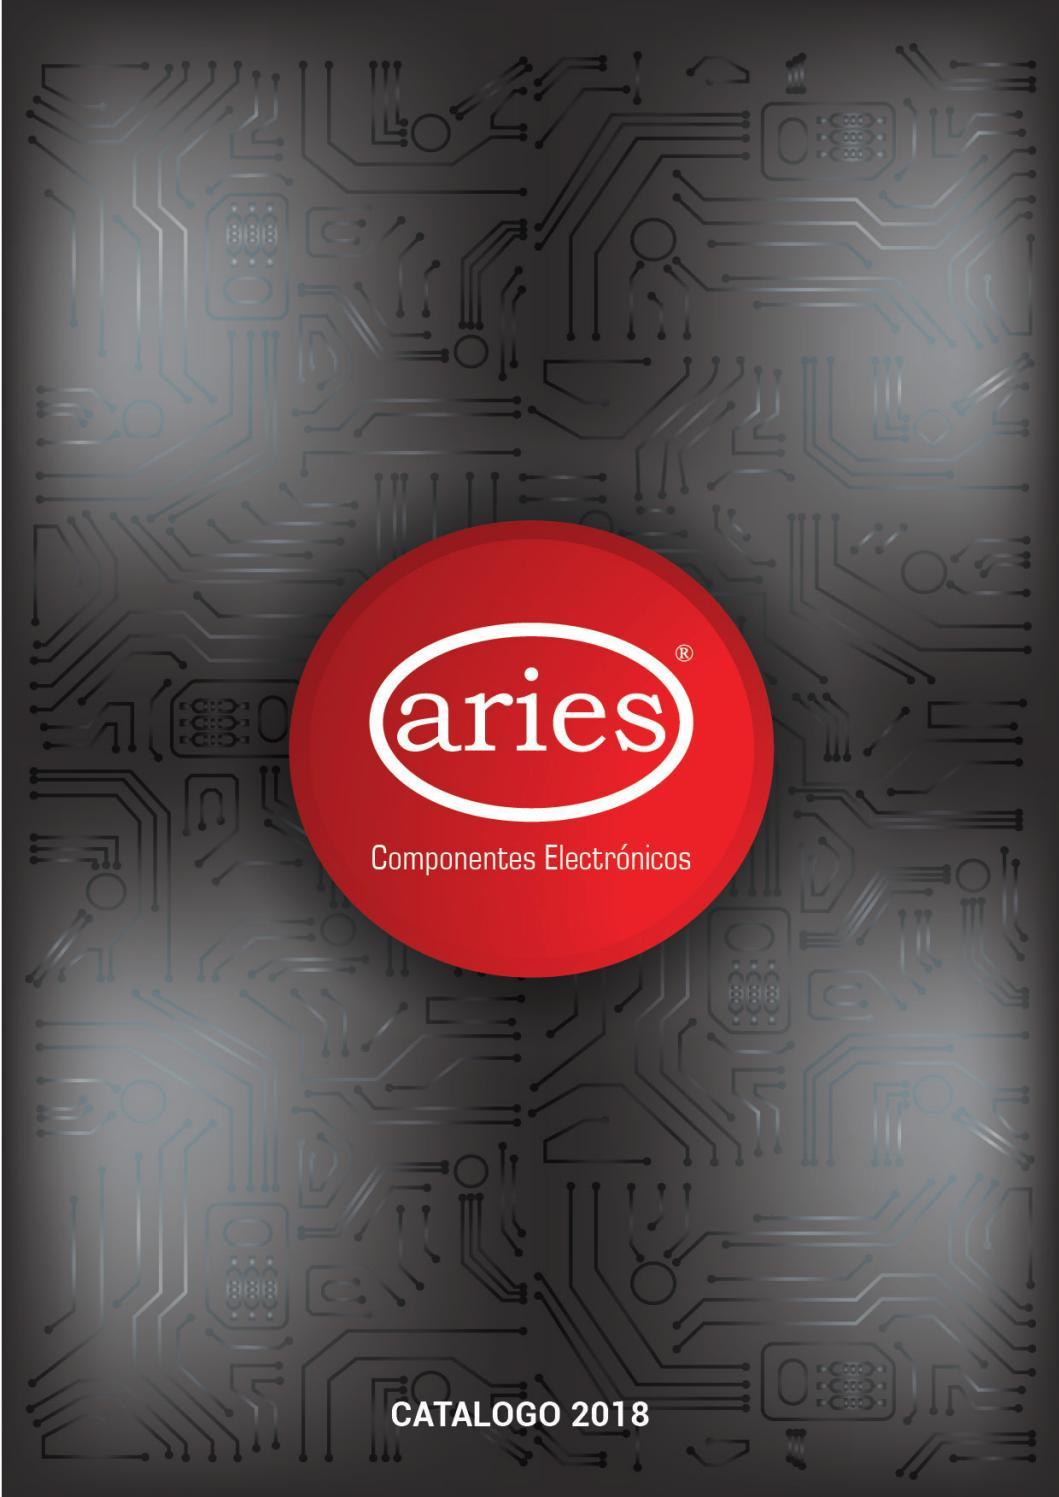 Aries Catalogo 2018 by Industrias Sur - issuu